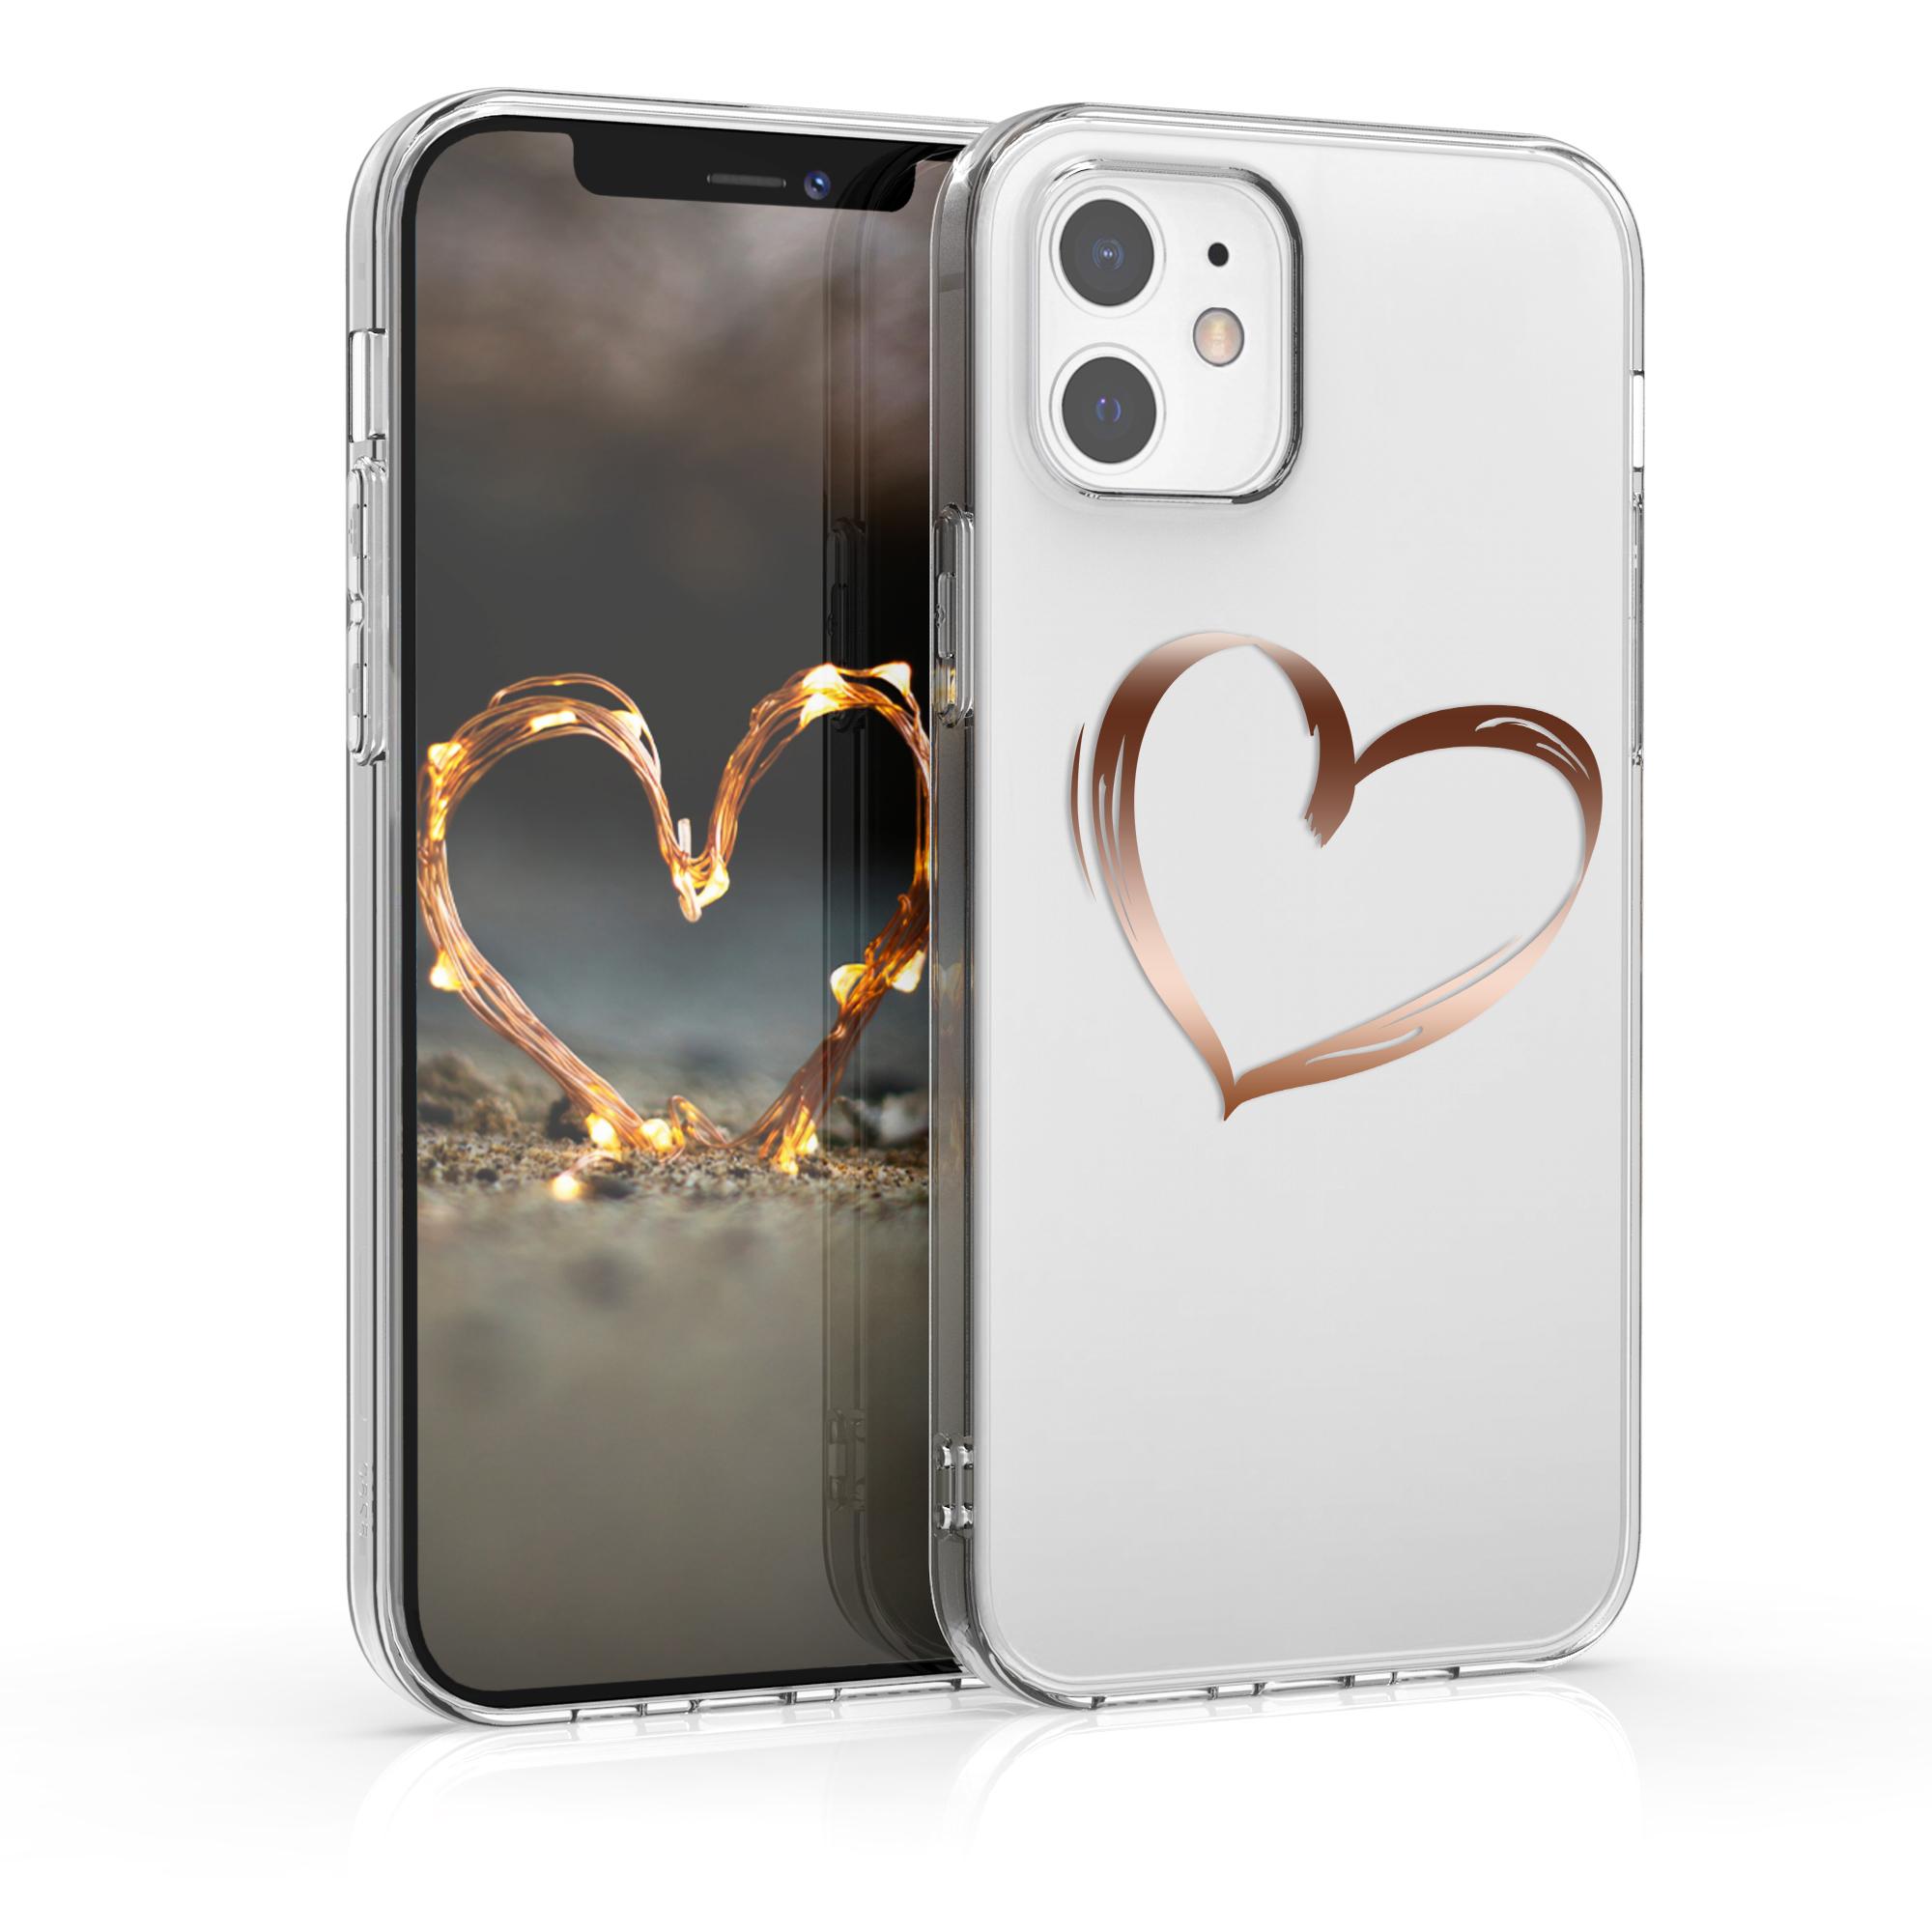 Kvalitní silikonové TPU pouzdro pro Apple iPhone 12 / 12 Pro - Brushed Heart Rose Gold | Transparent